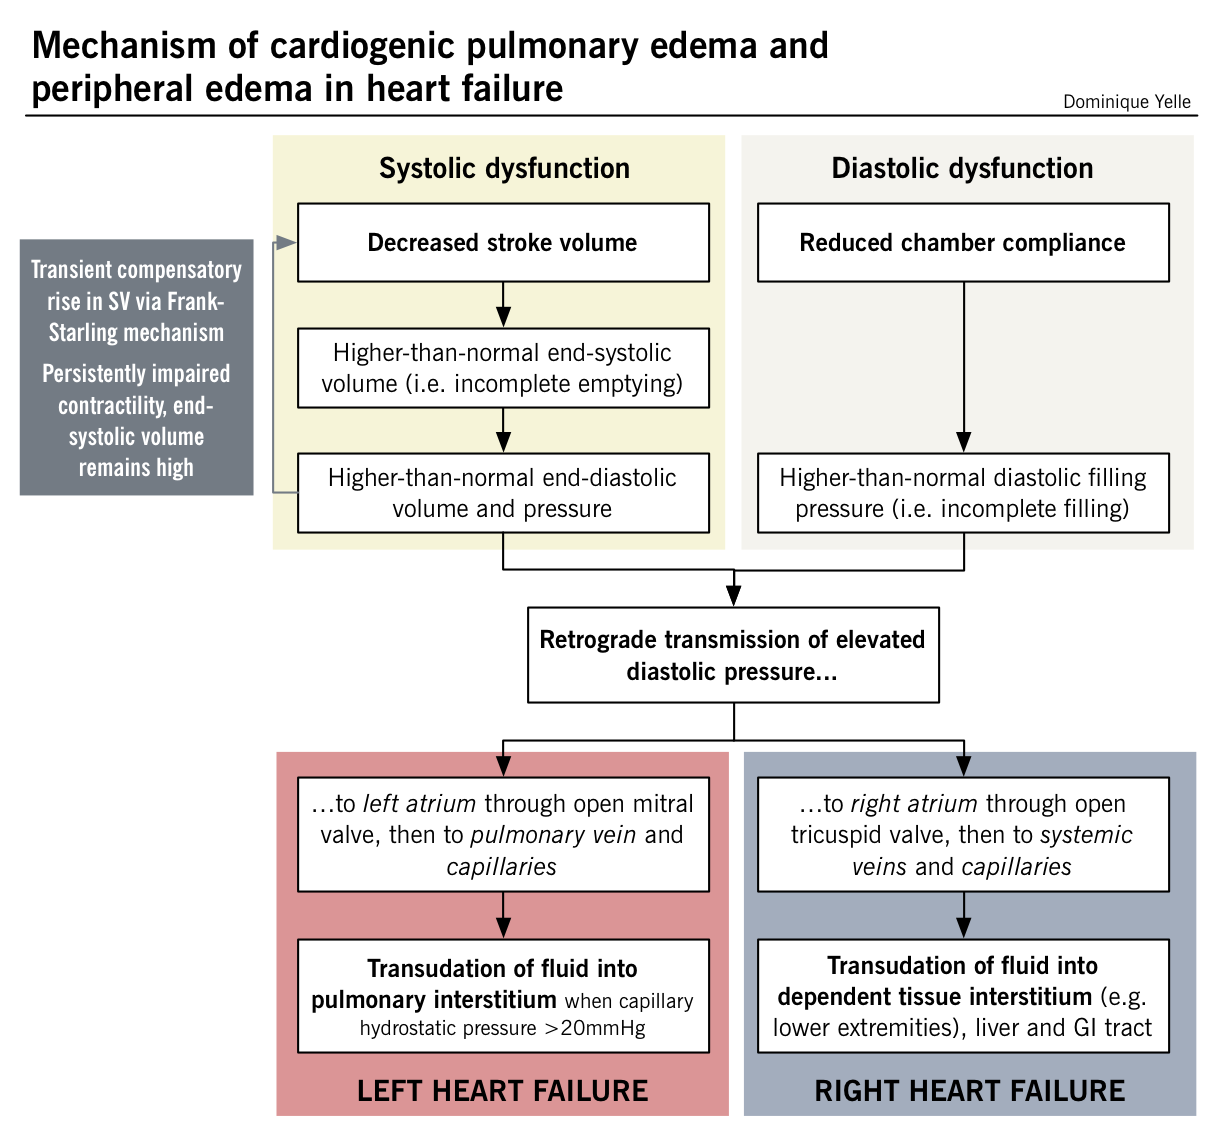 Mechanism Of Cardiogenic Pulmonary Edema And Peripheral Edema In Heart Failure